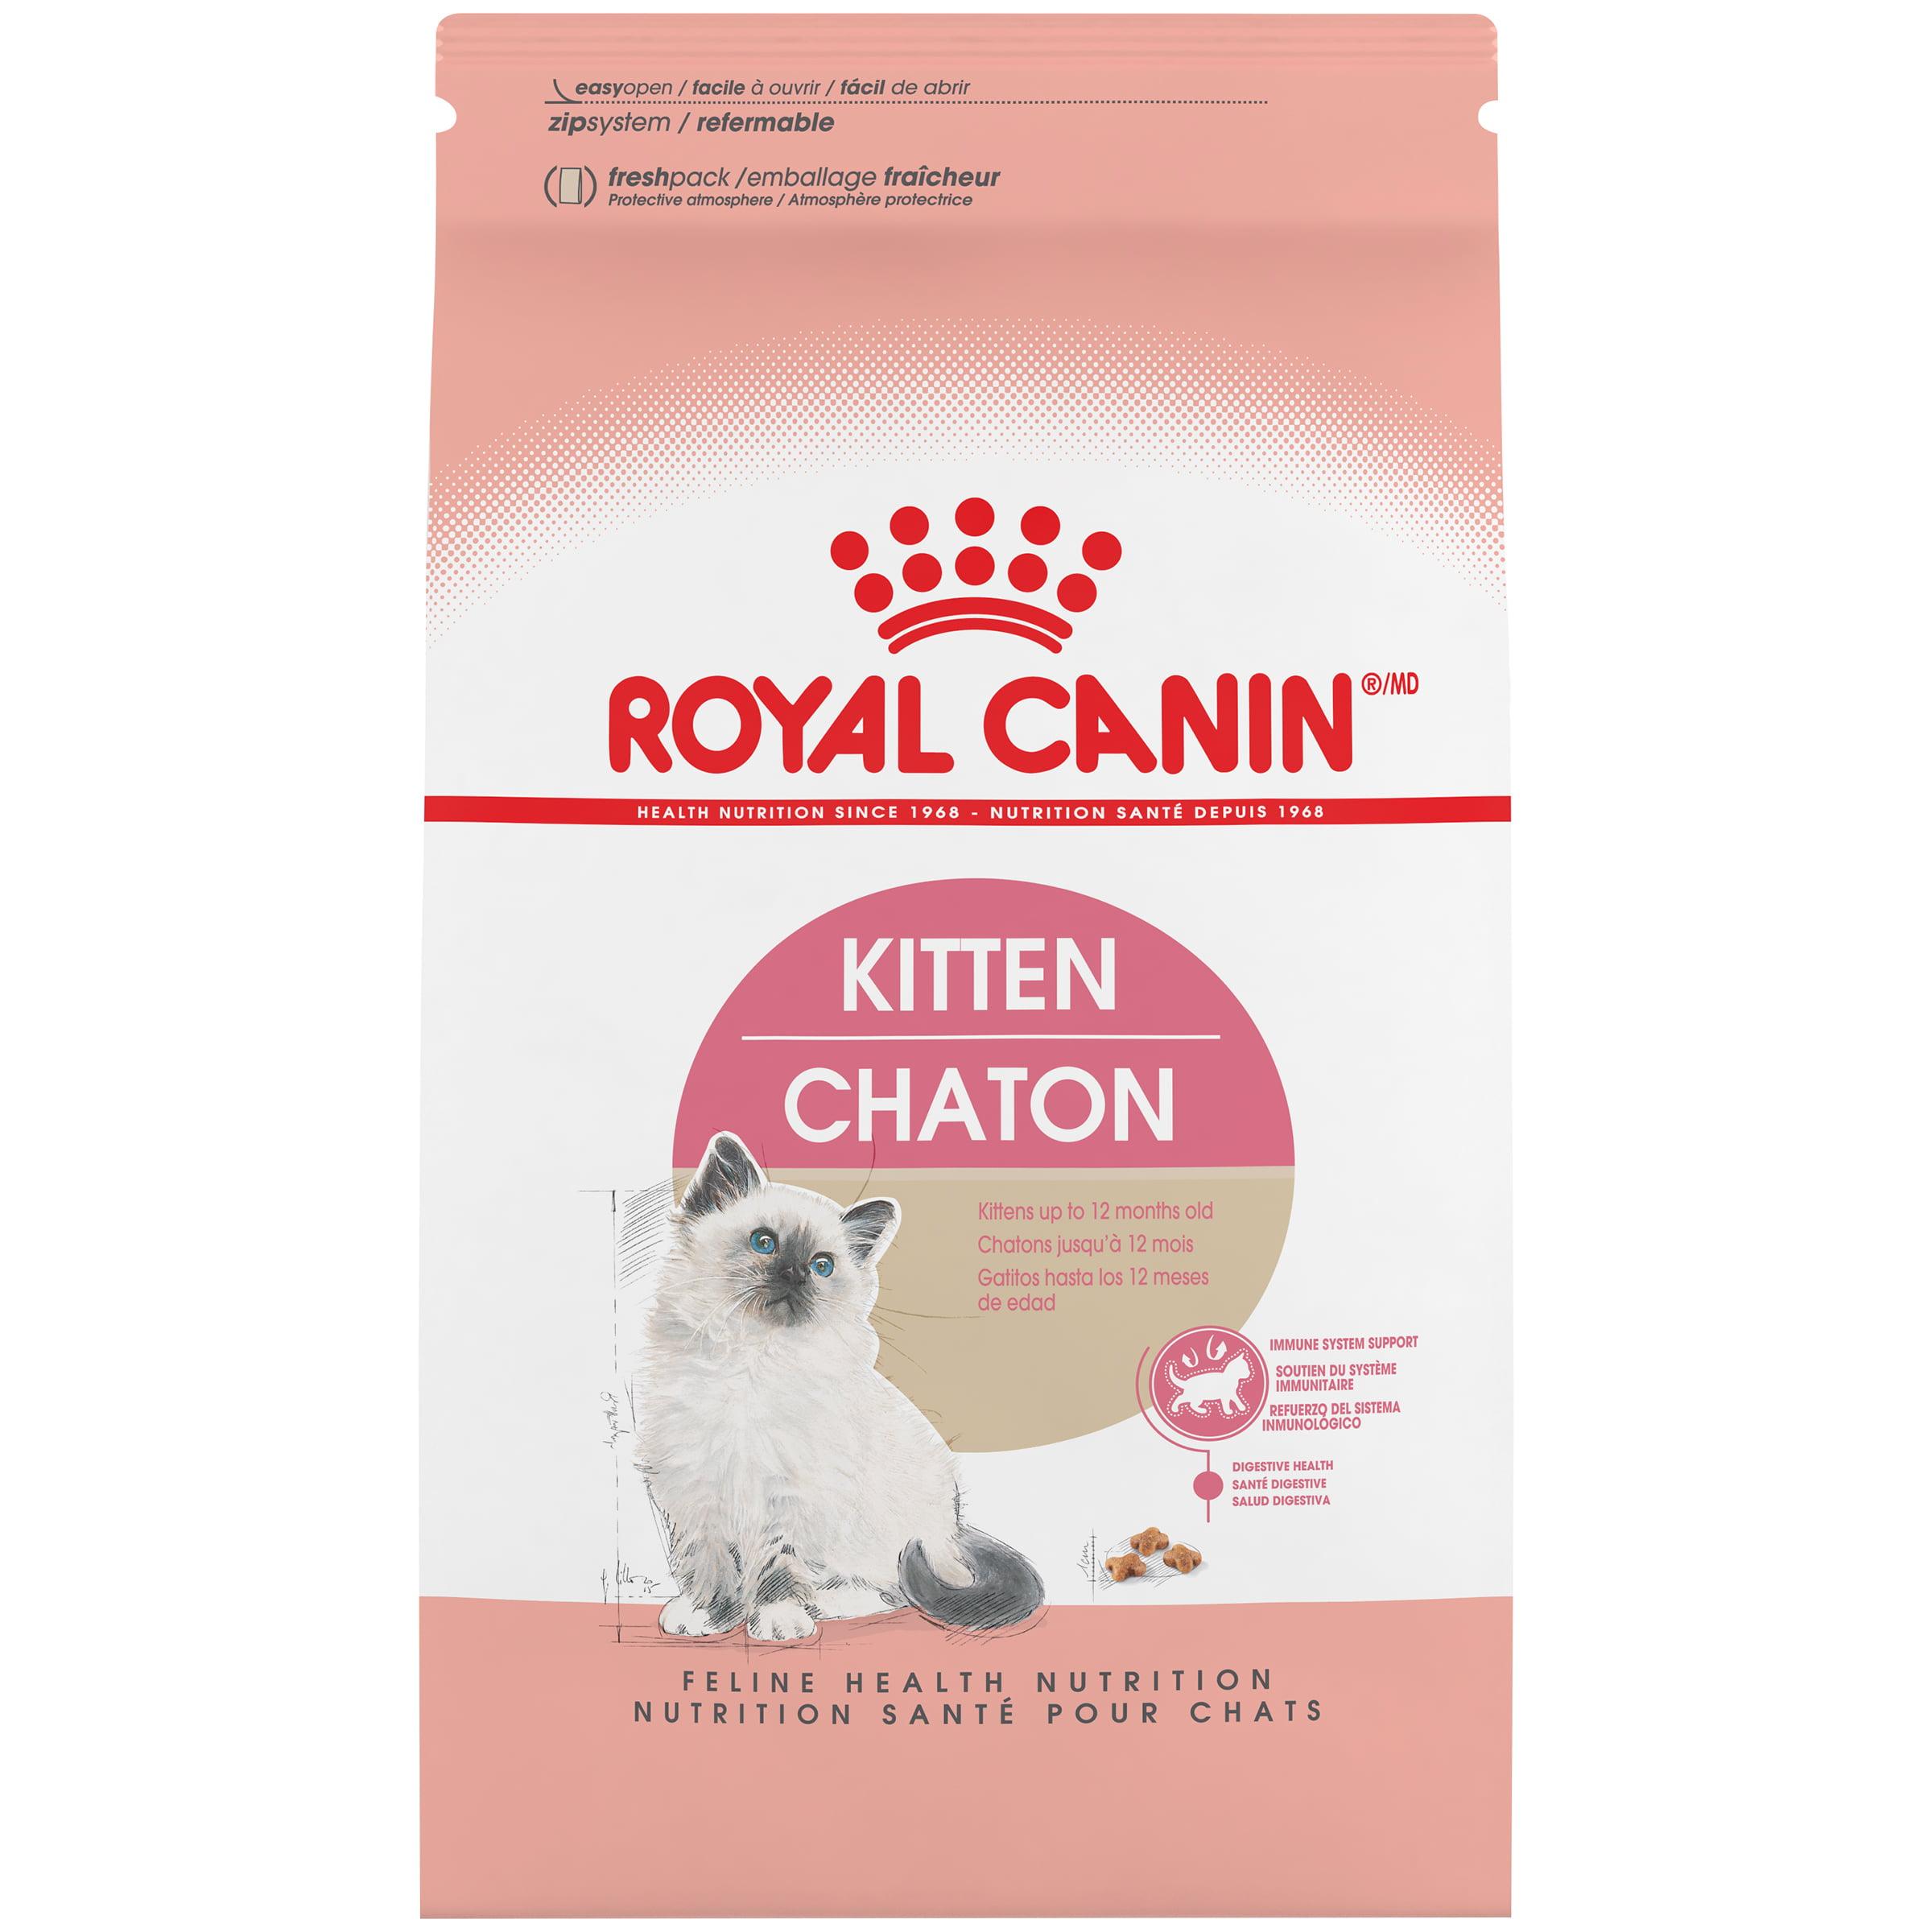 Royal Canin Kitten Dry Cat Food, 3.5 lb